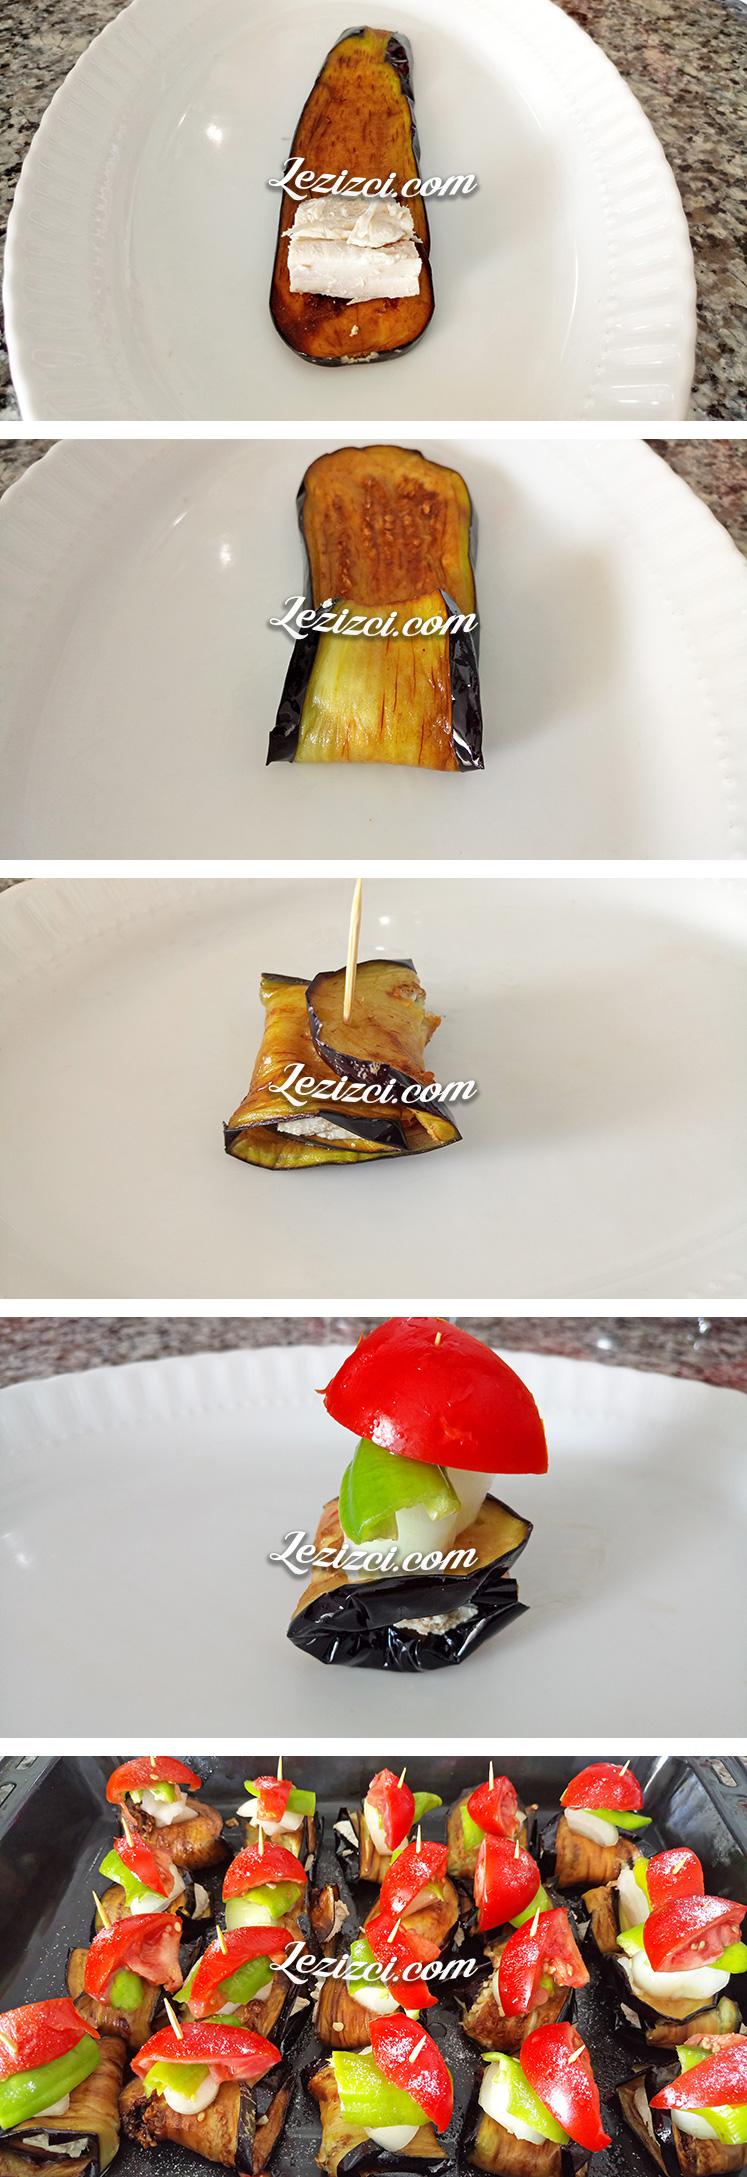 Hindili Patlıcan Sarma Nasıl Yapılır?